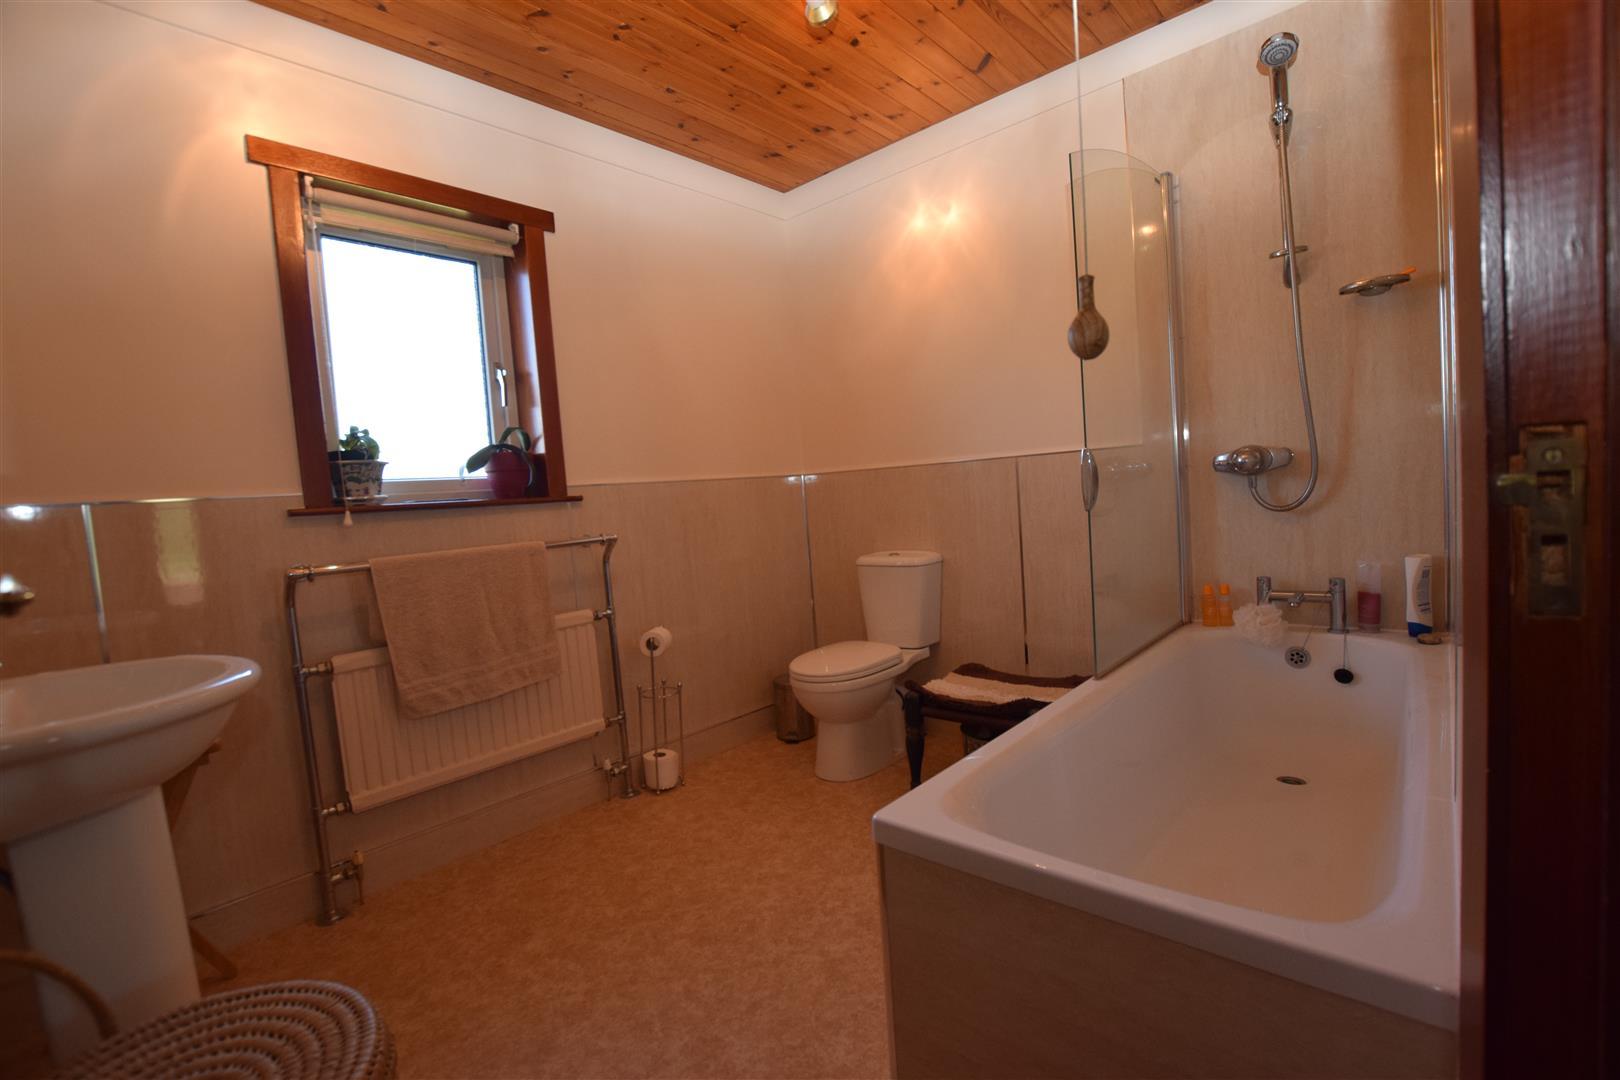 2, Castle Way, St Madoes, Glencarse, Perth, Perthshire, PH2 7NY, UK